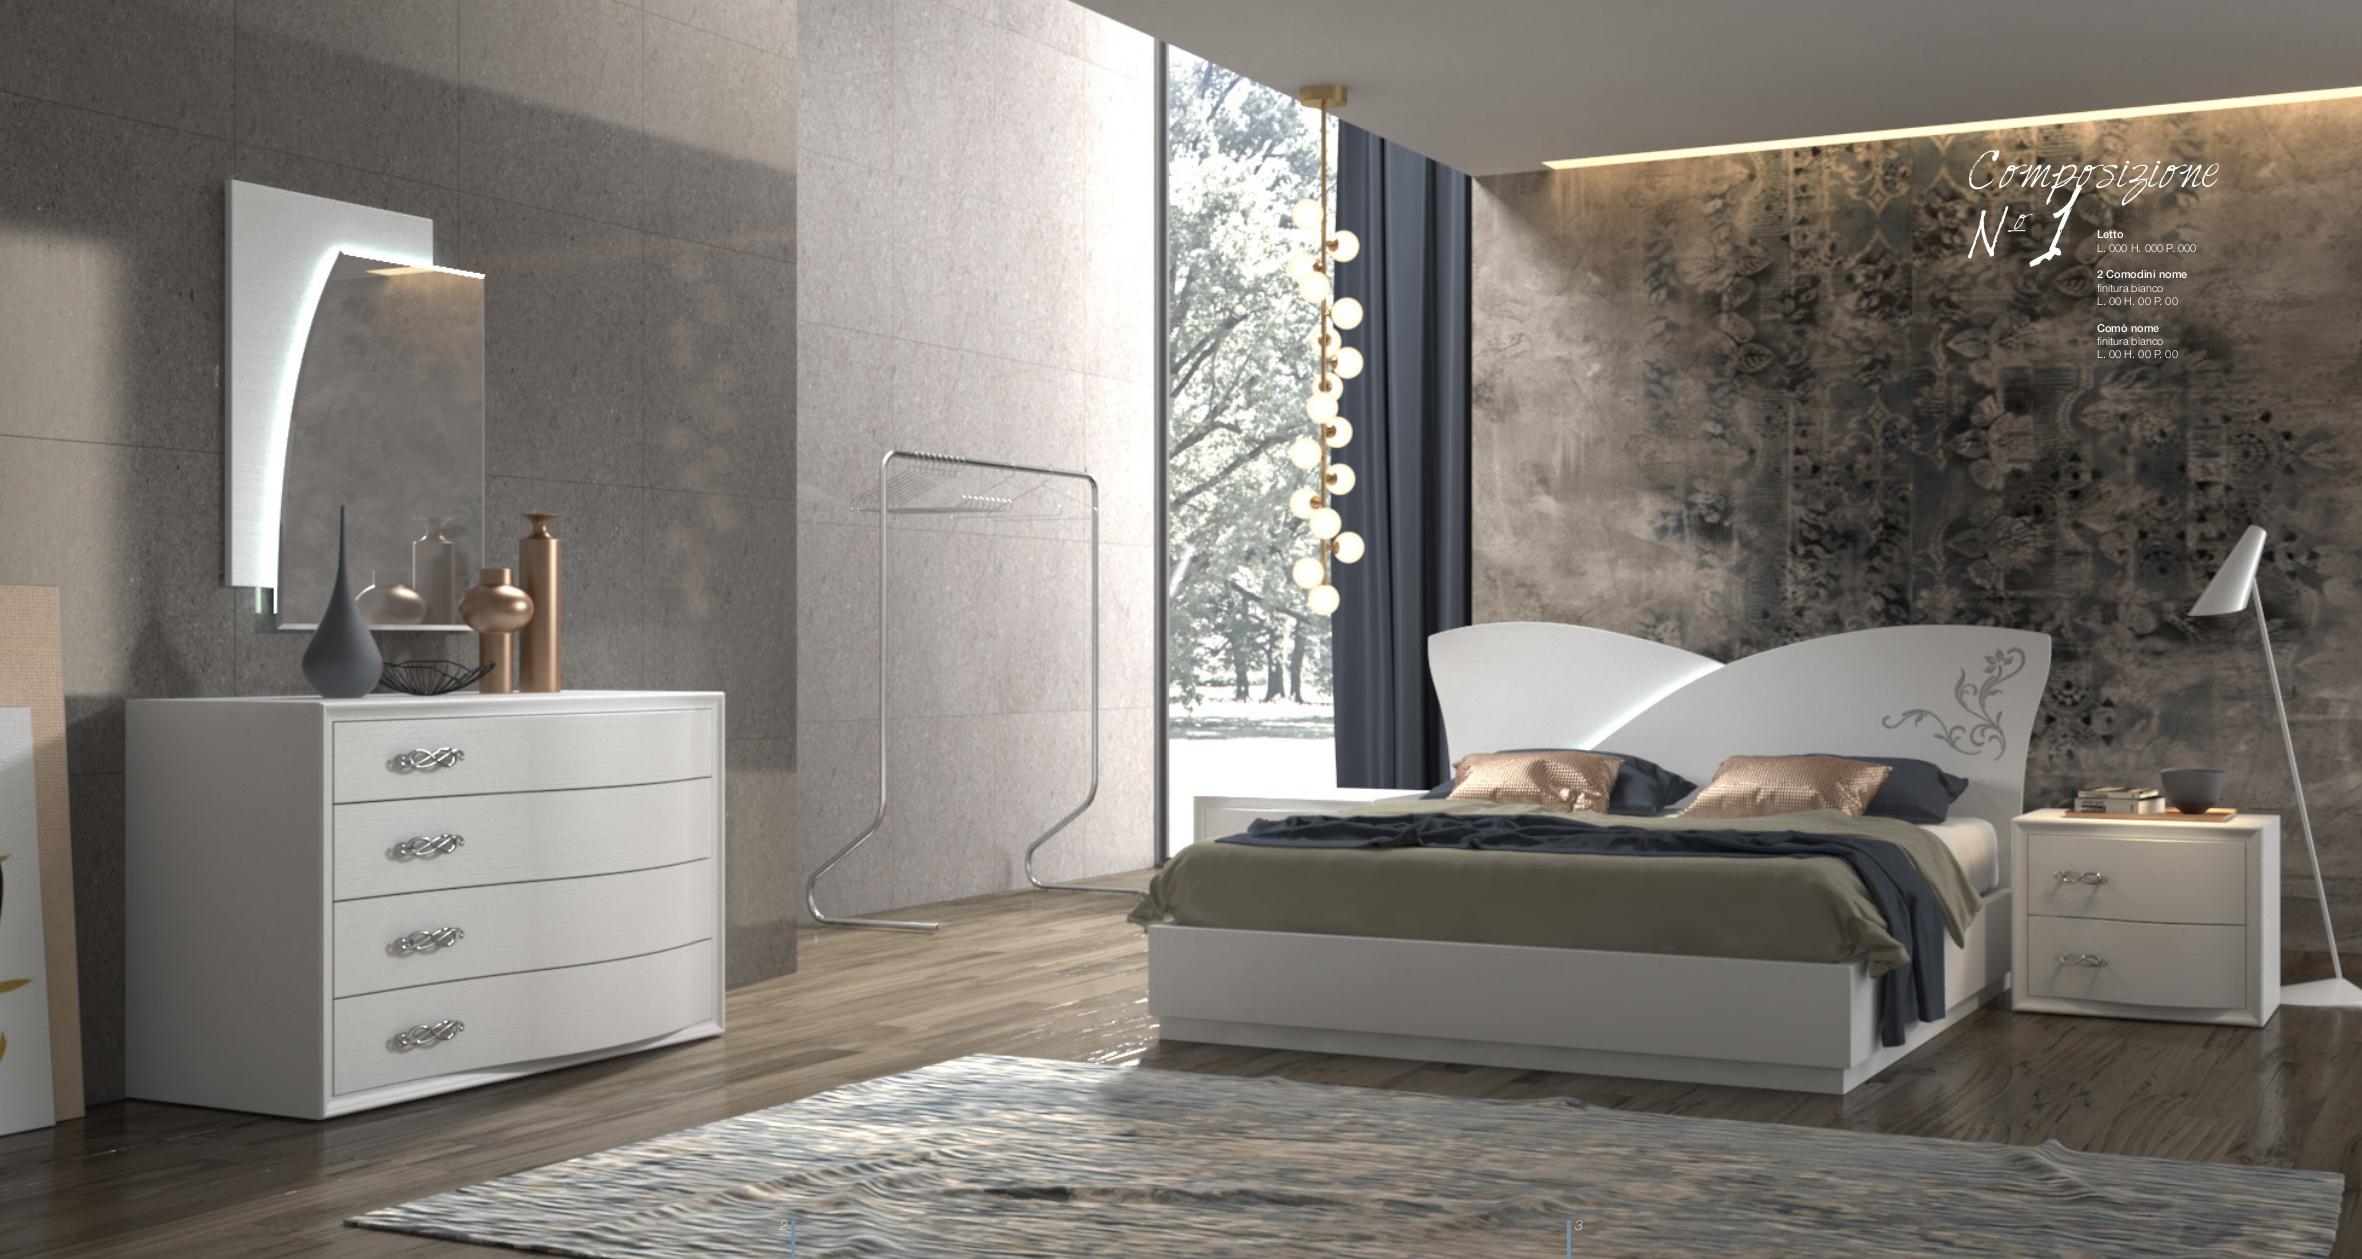 Camera da letto moderna contemporanea sicilia catania messina enna siracusa ragusa misterbianco - Stanza da pranzo moderna ...